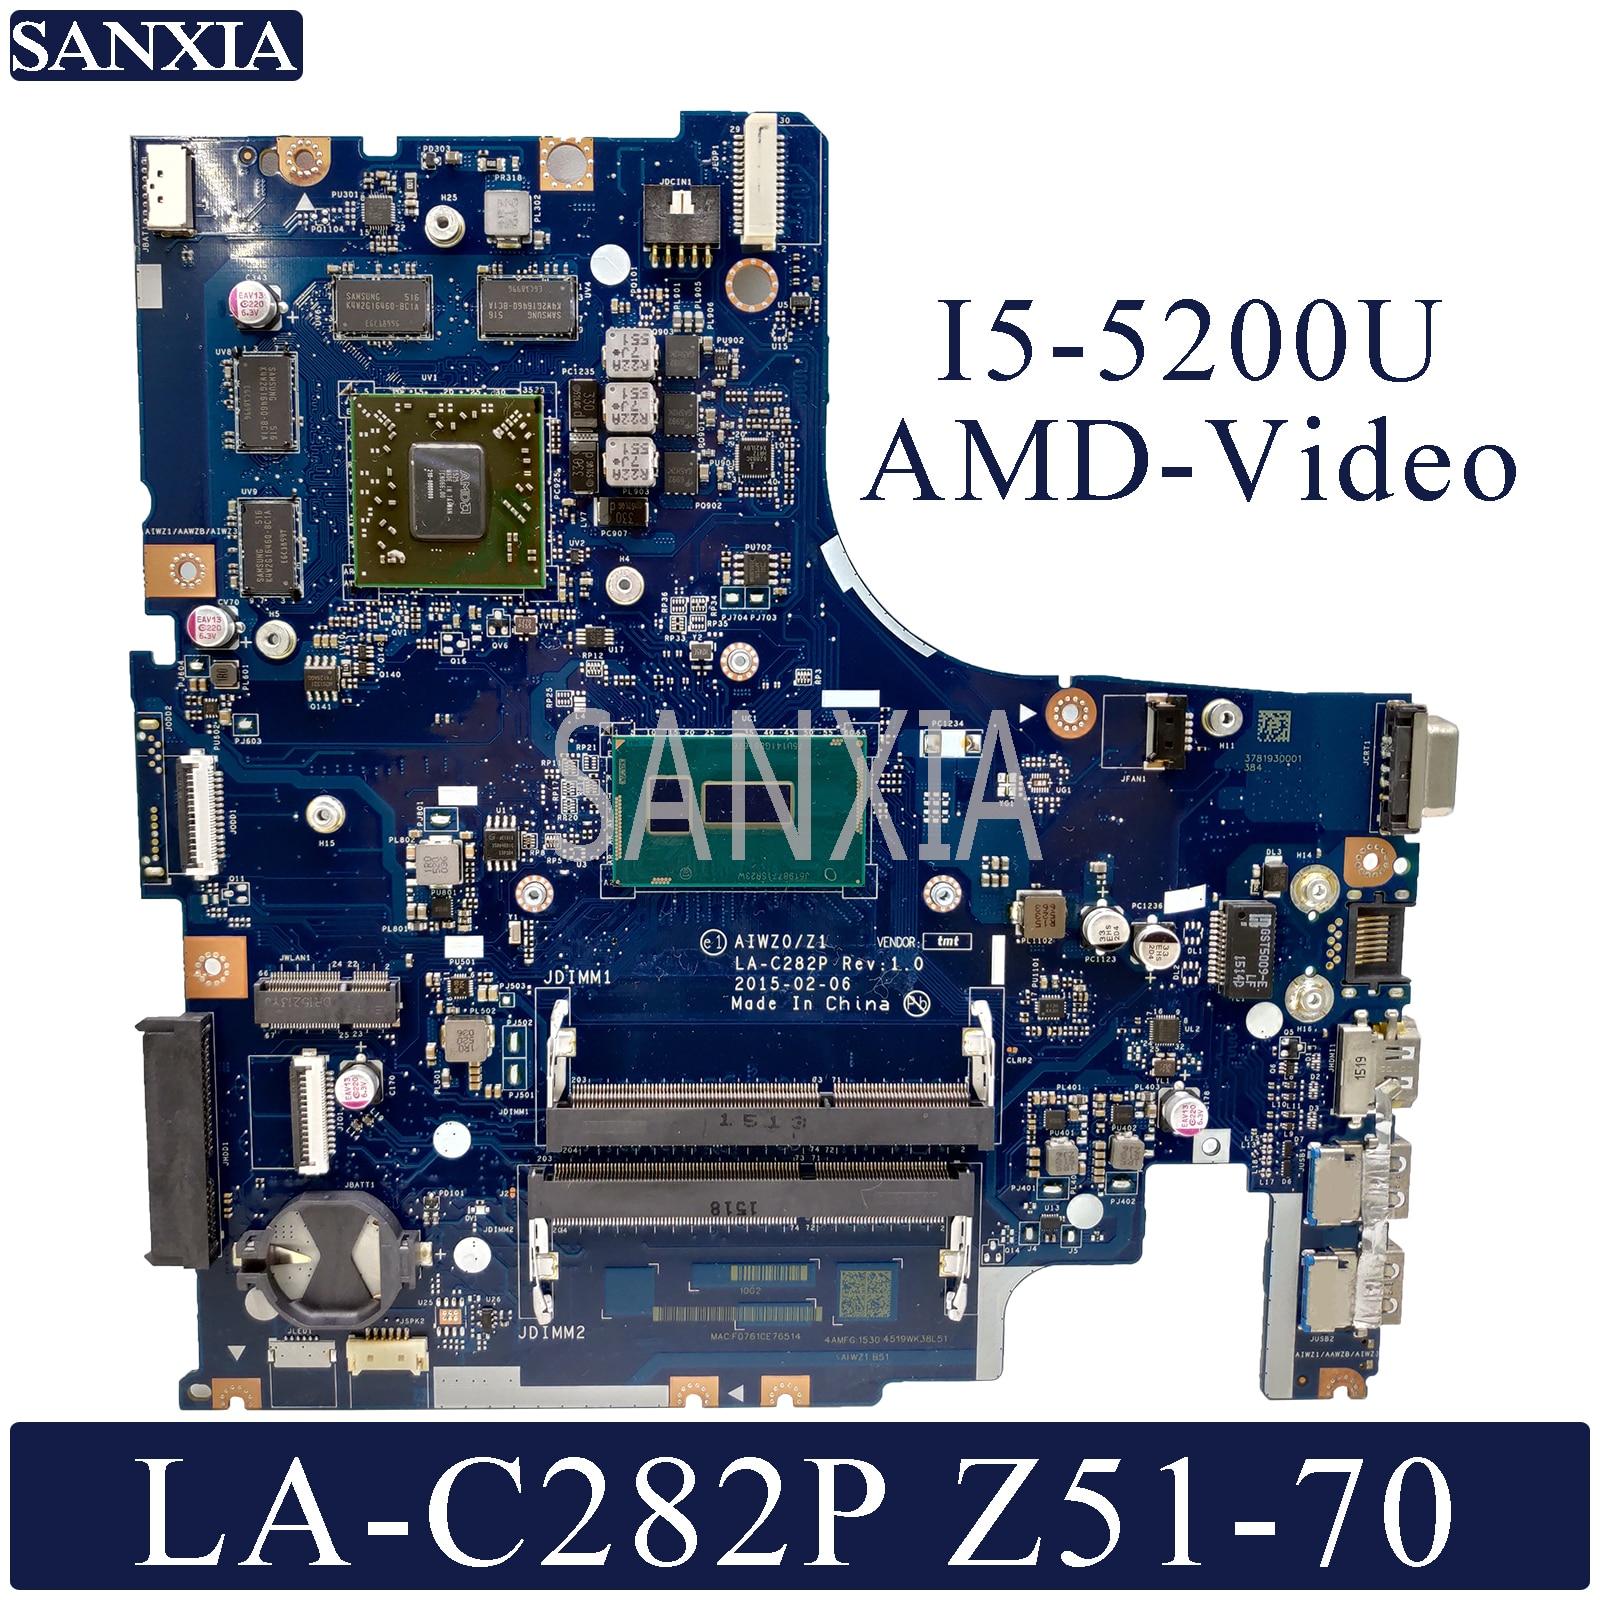 KEFU LA C282P Laptop motherboard for Lenovo Ideapad Z51 70 original mainboard I5 5200U AMD Video